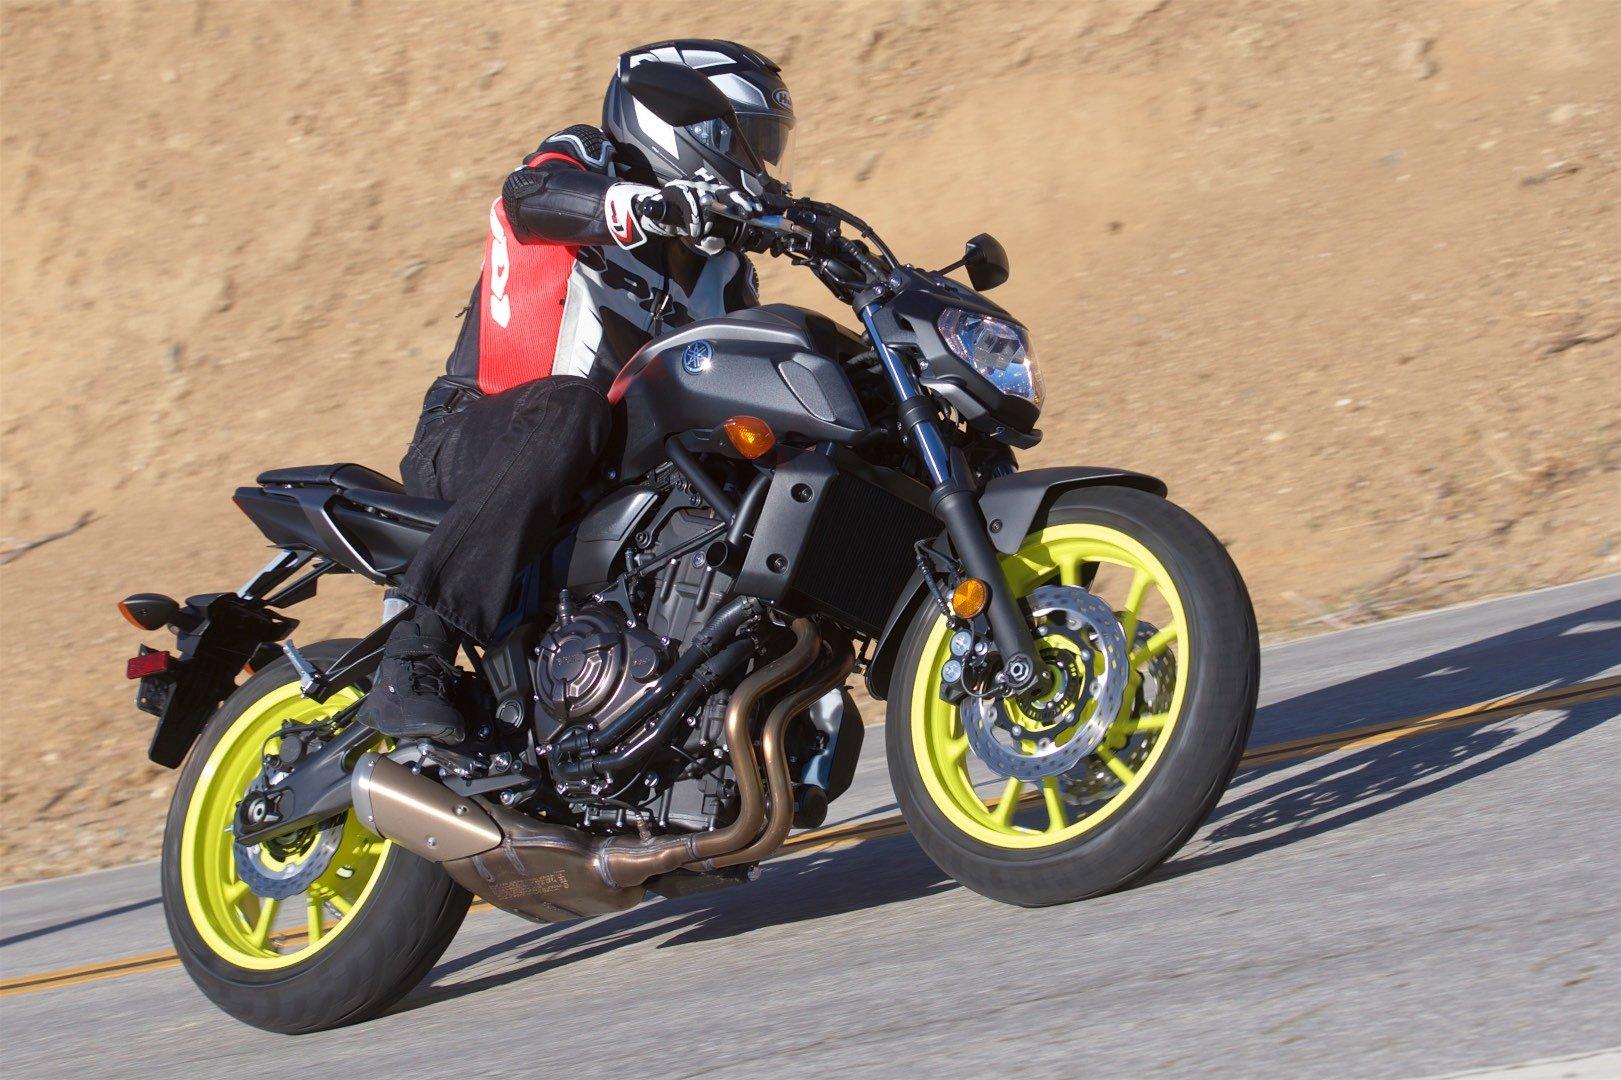 2018 Yamaha MT-07 test